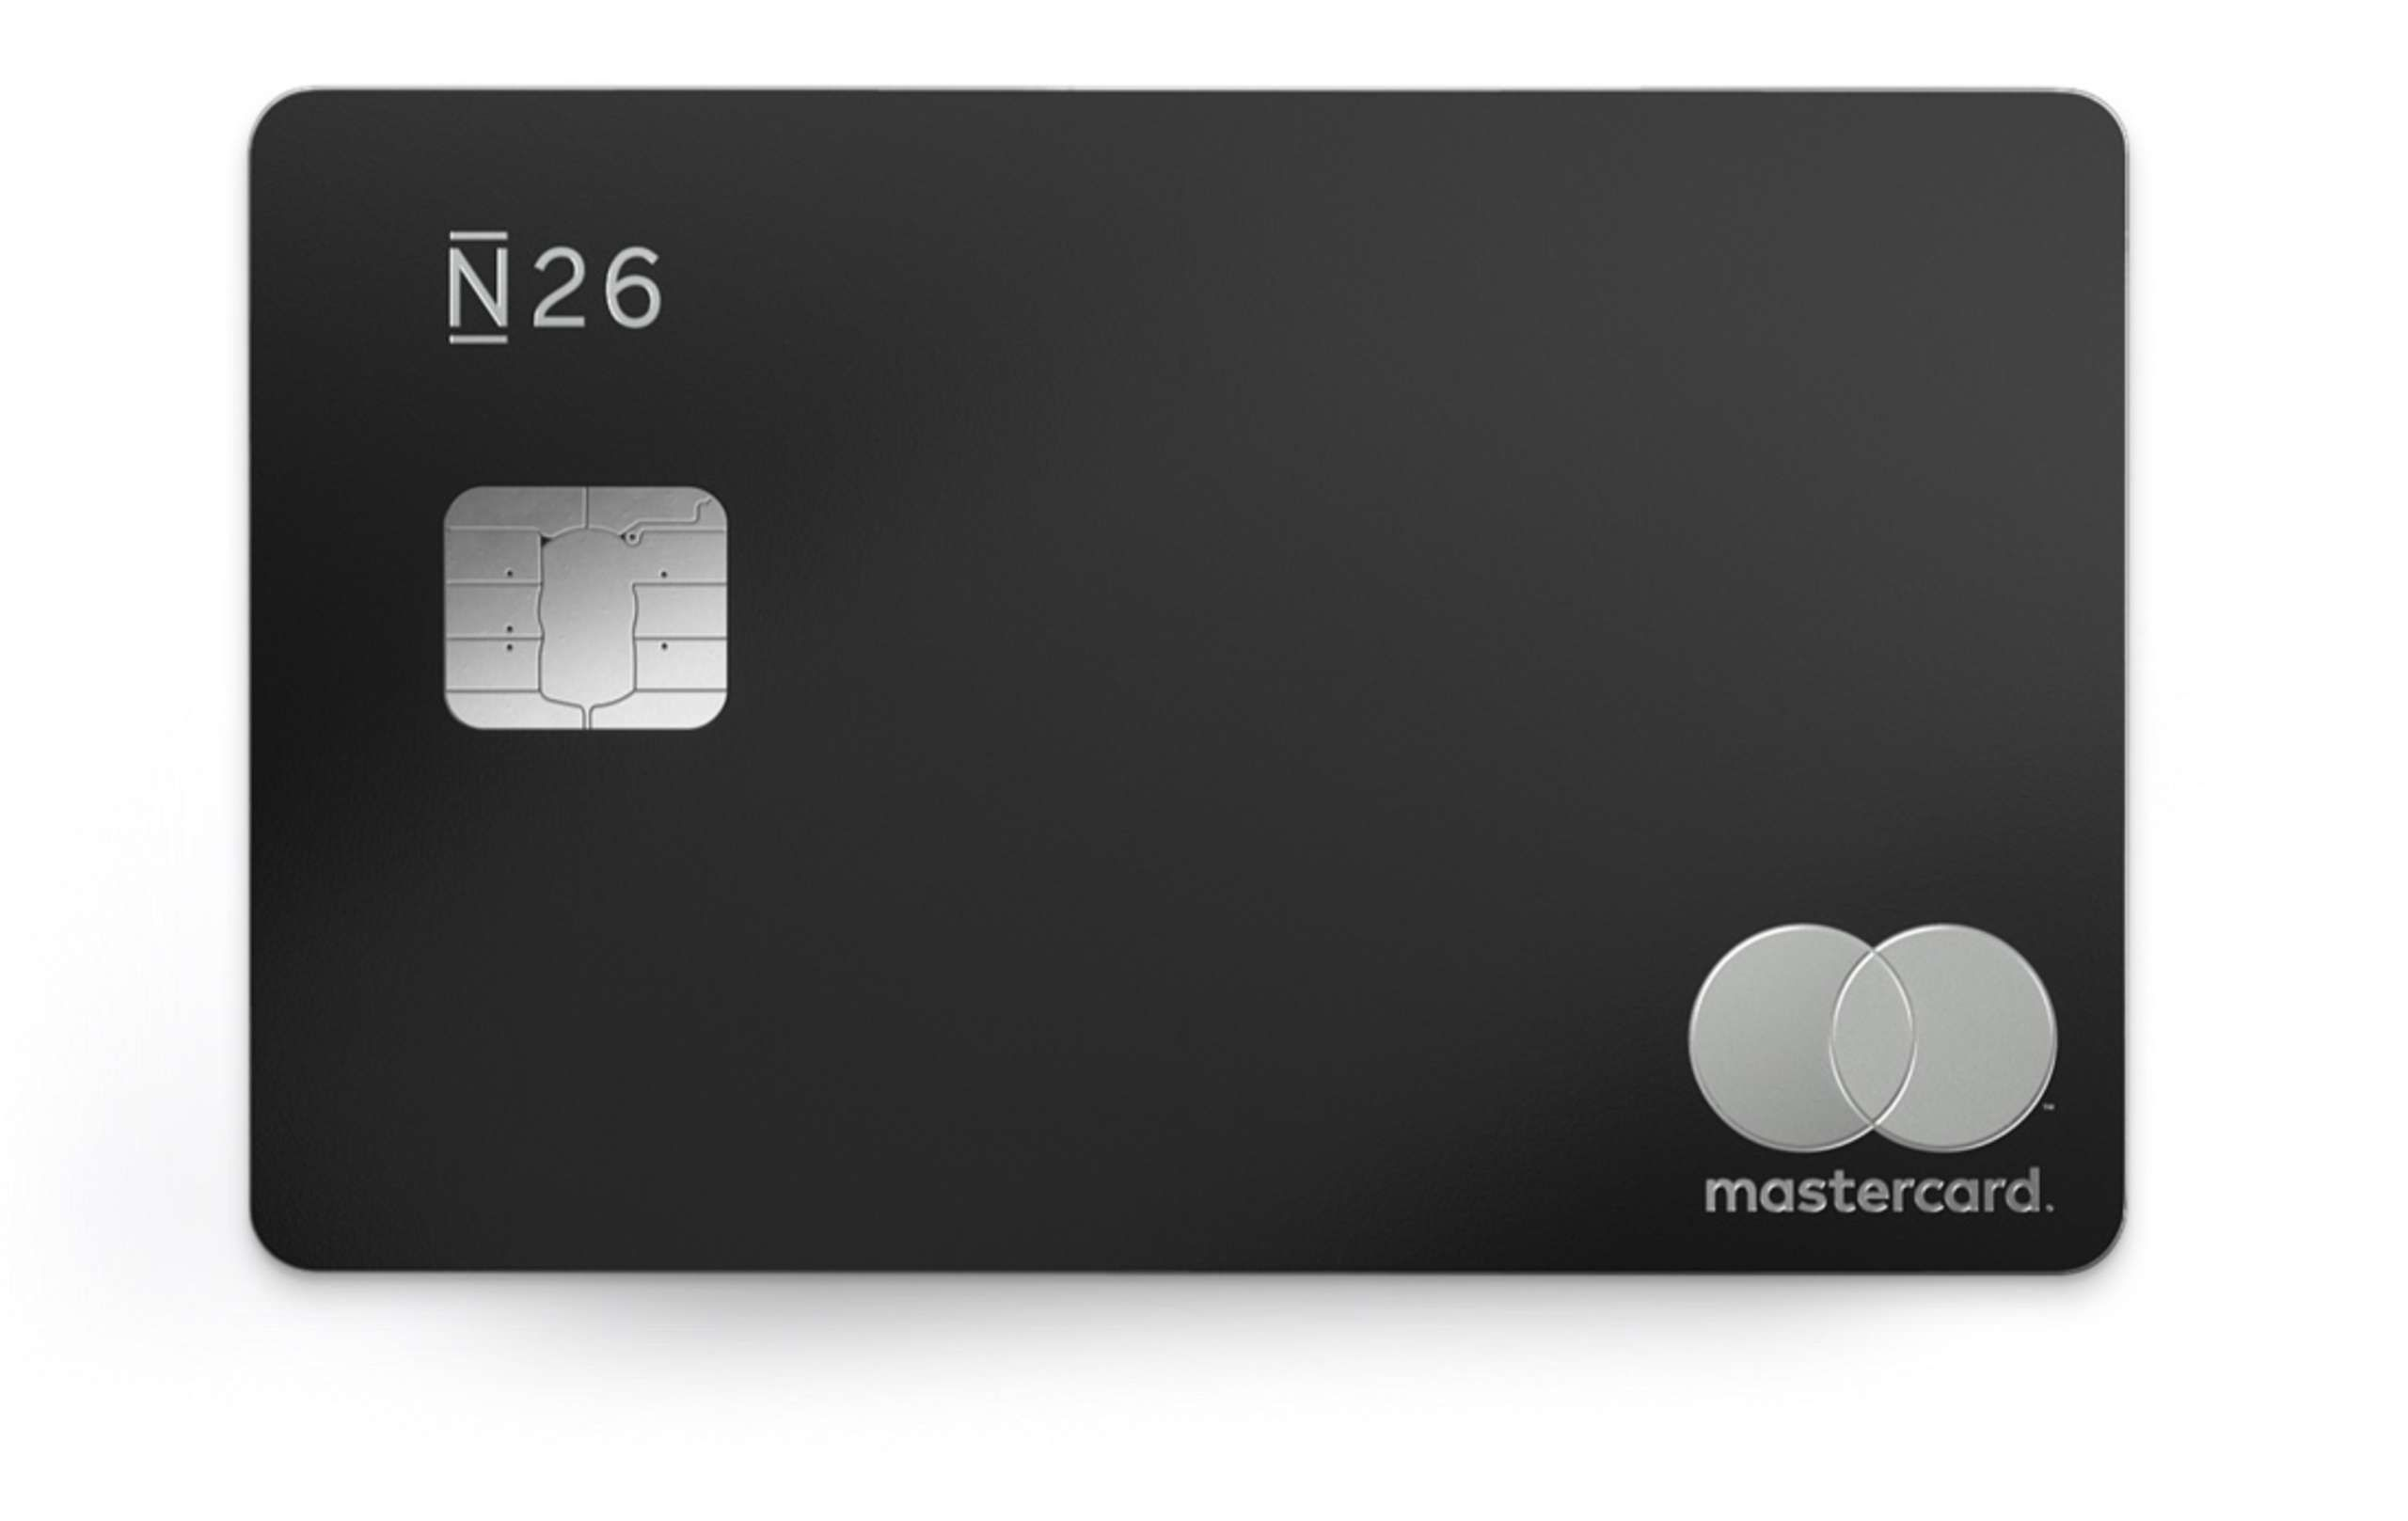 Black Credit Card Credit Card Design Graphic Design Business Card Debit Card Design